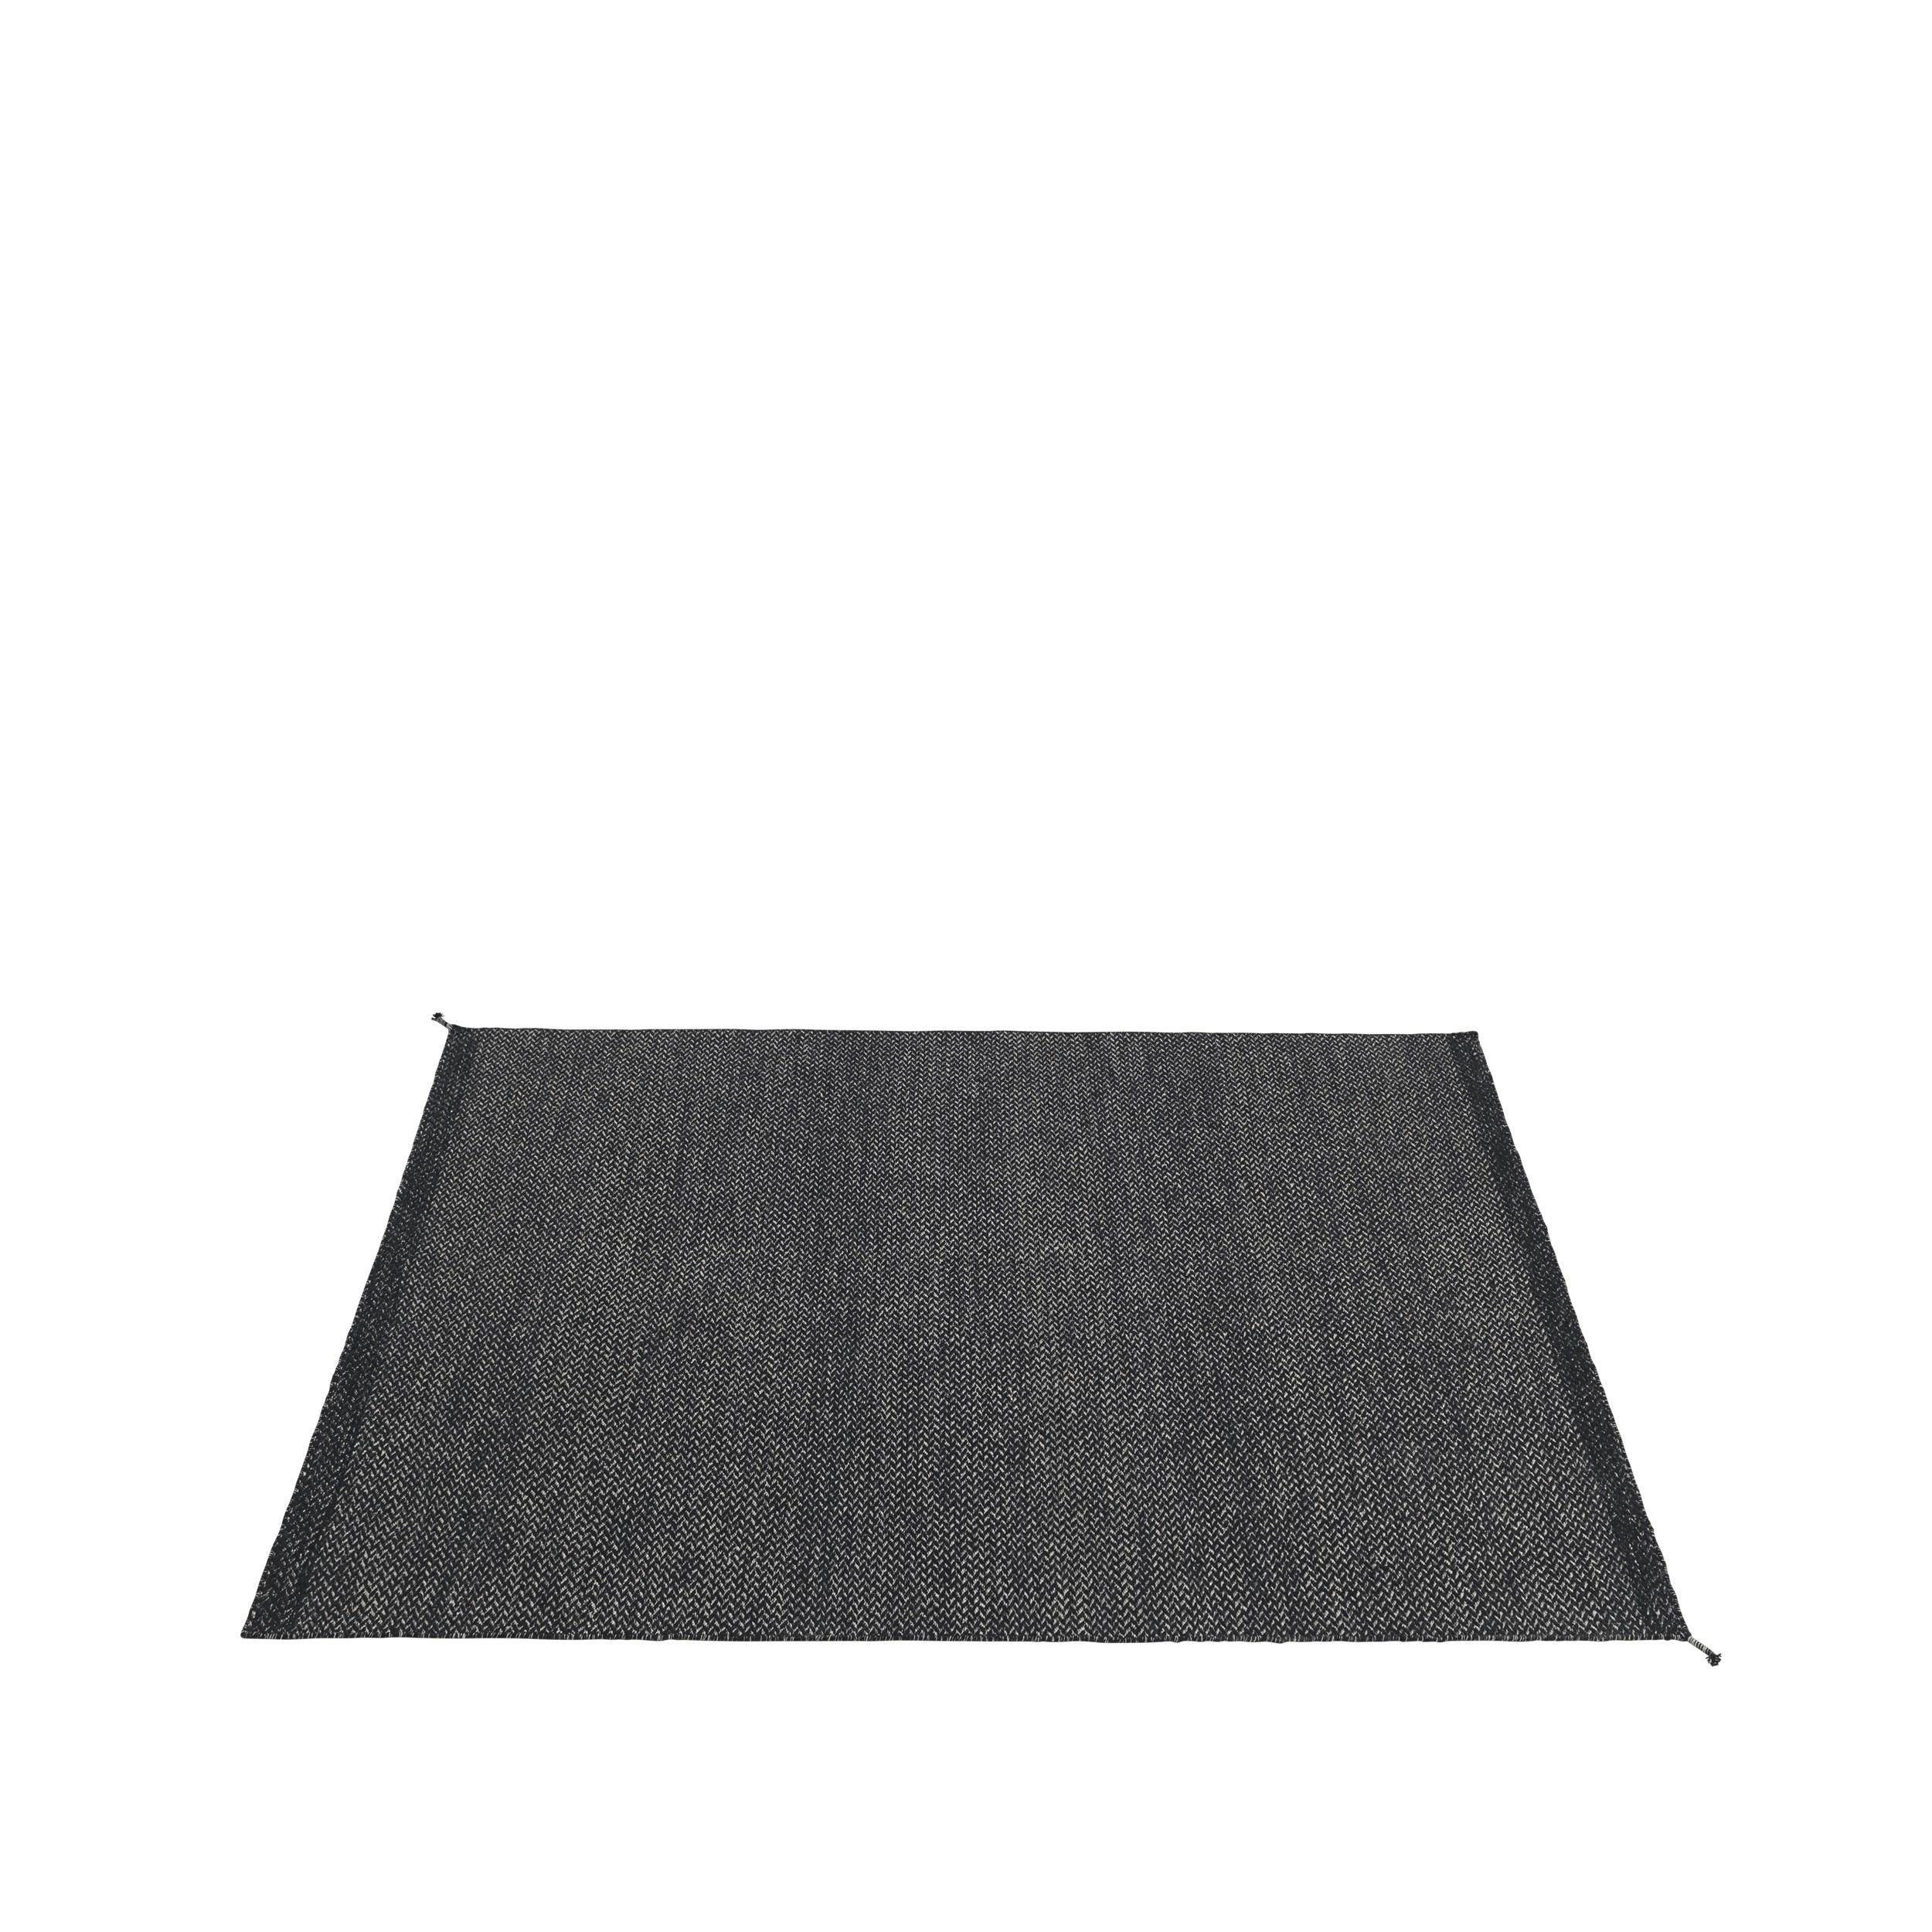 Ply rug 170 x 240 midnight blue